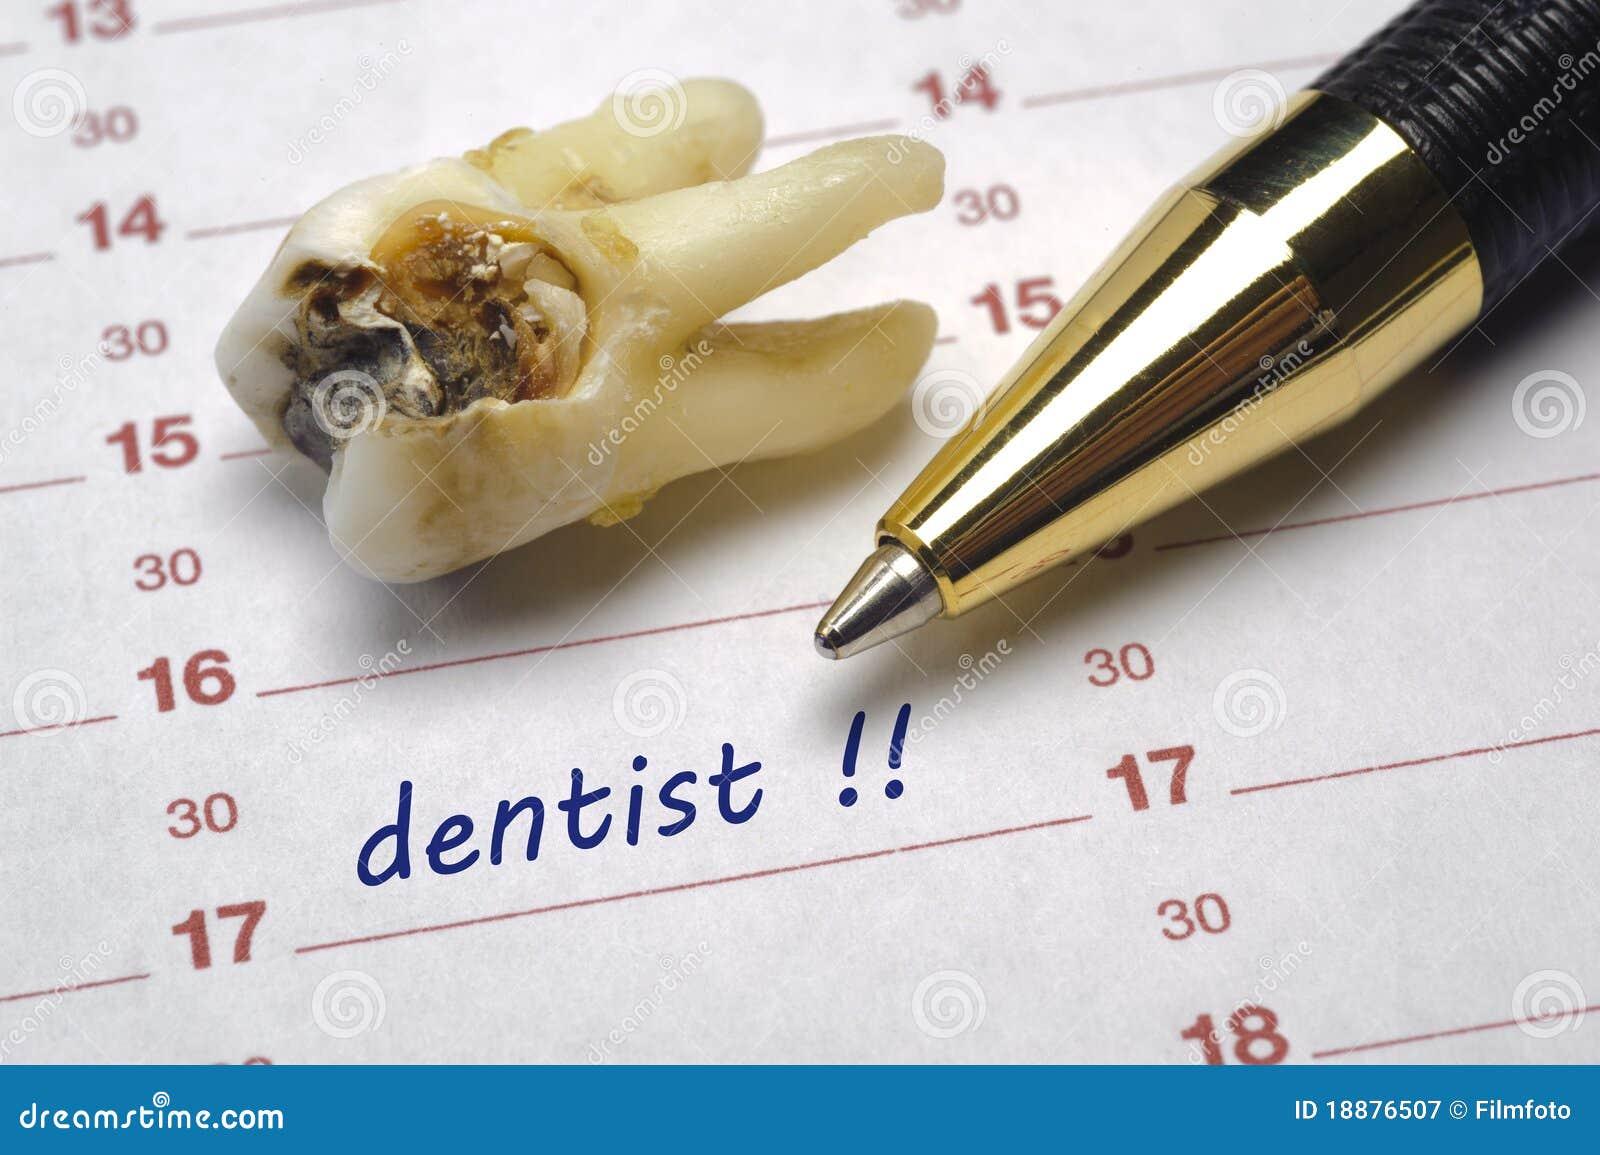 dentist online dating Dr carol morgan is an online dating coach in dayton, ohio.